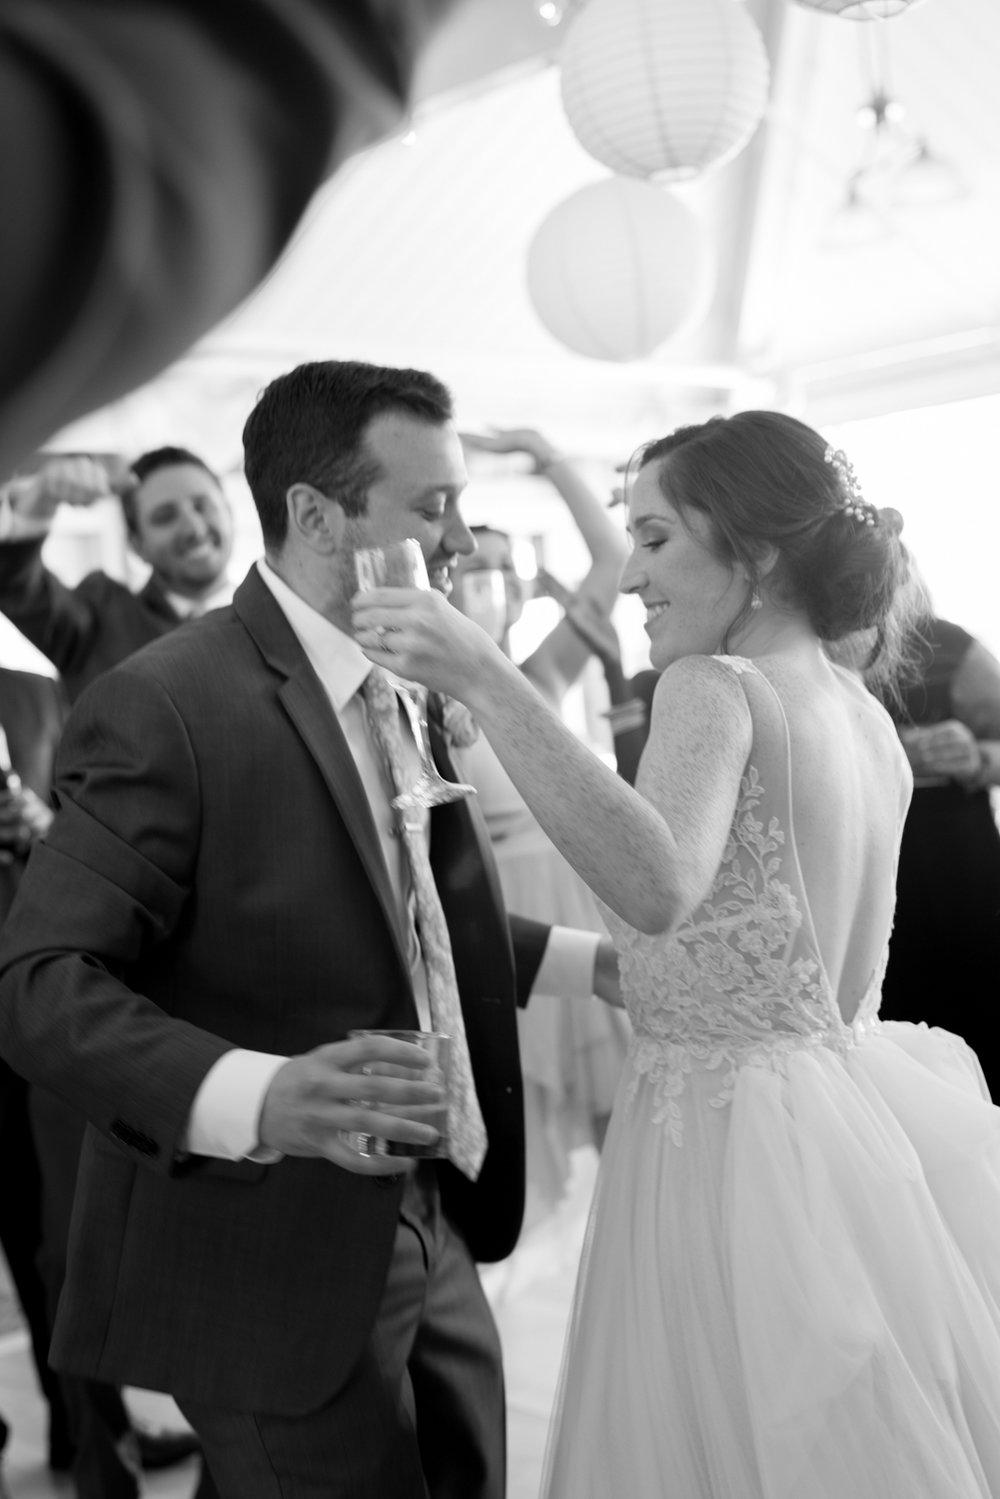 Jen+Tom- Liberty House Summer Wedding- Jersey City New Jersey- Olivia Christina Photography-1.JPG